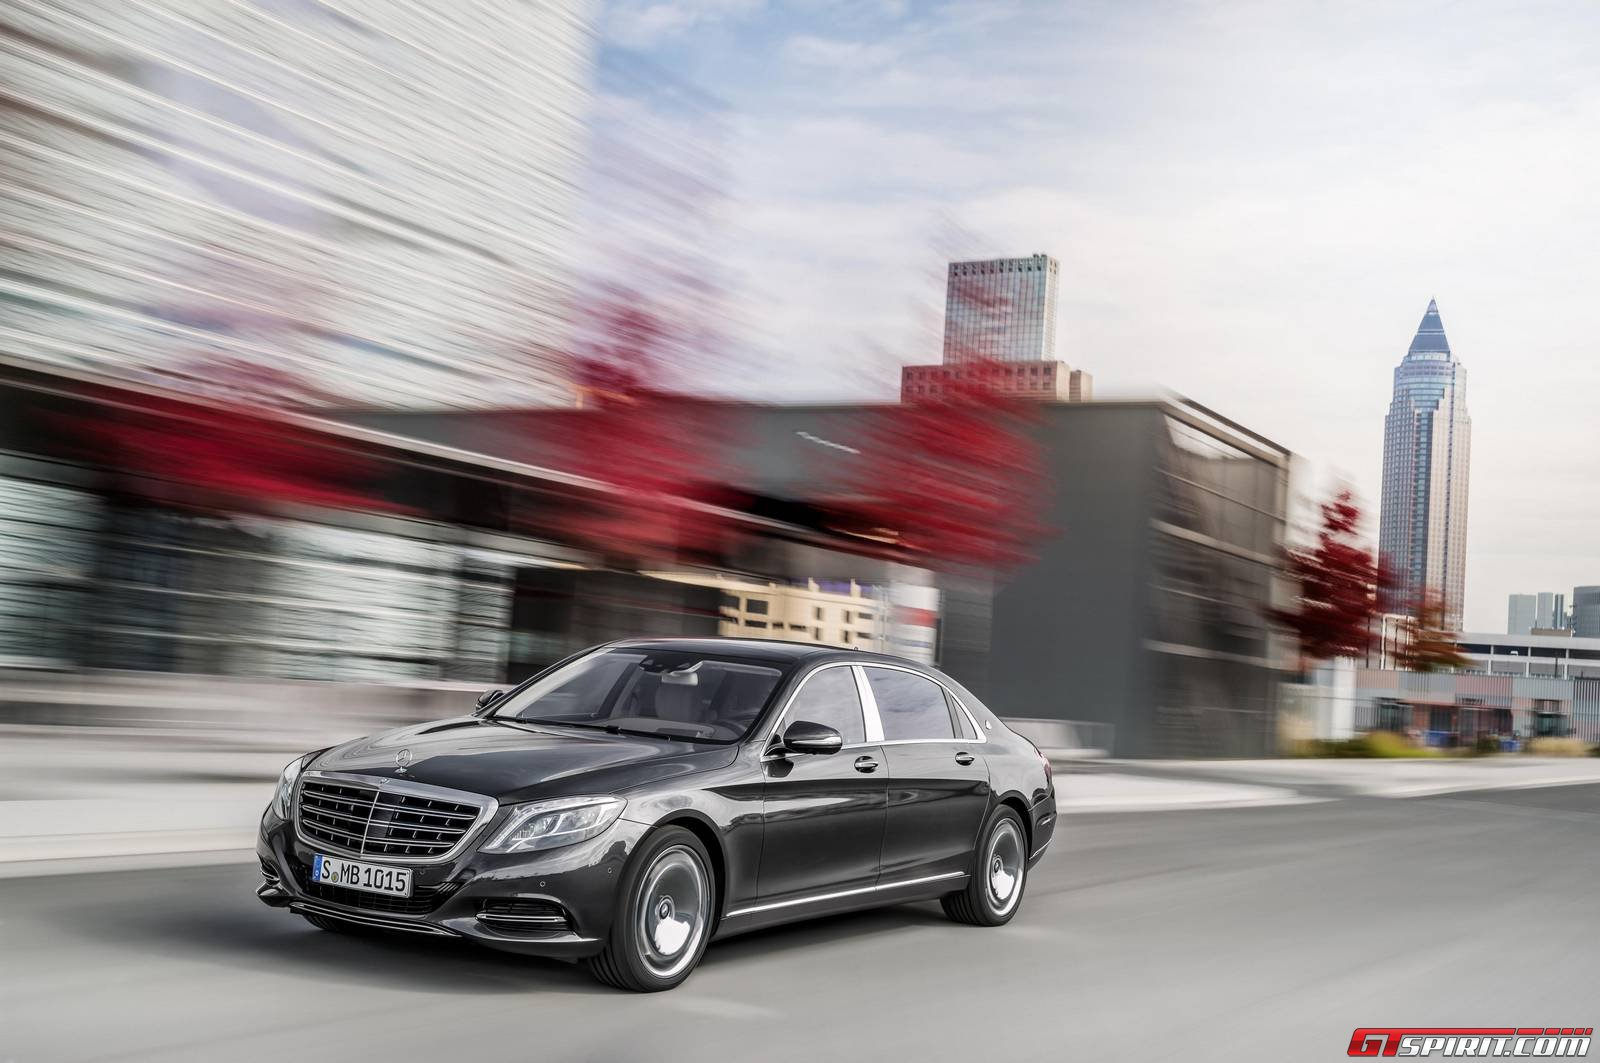 2015 Mercedes-Maybach S-Class